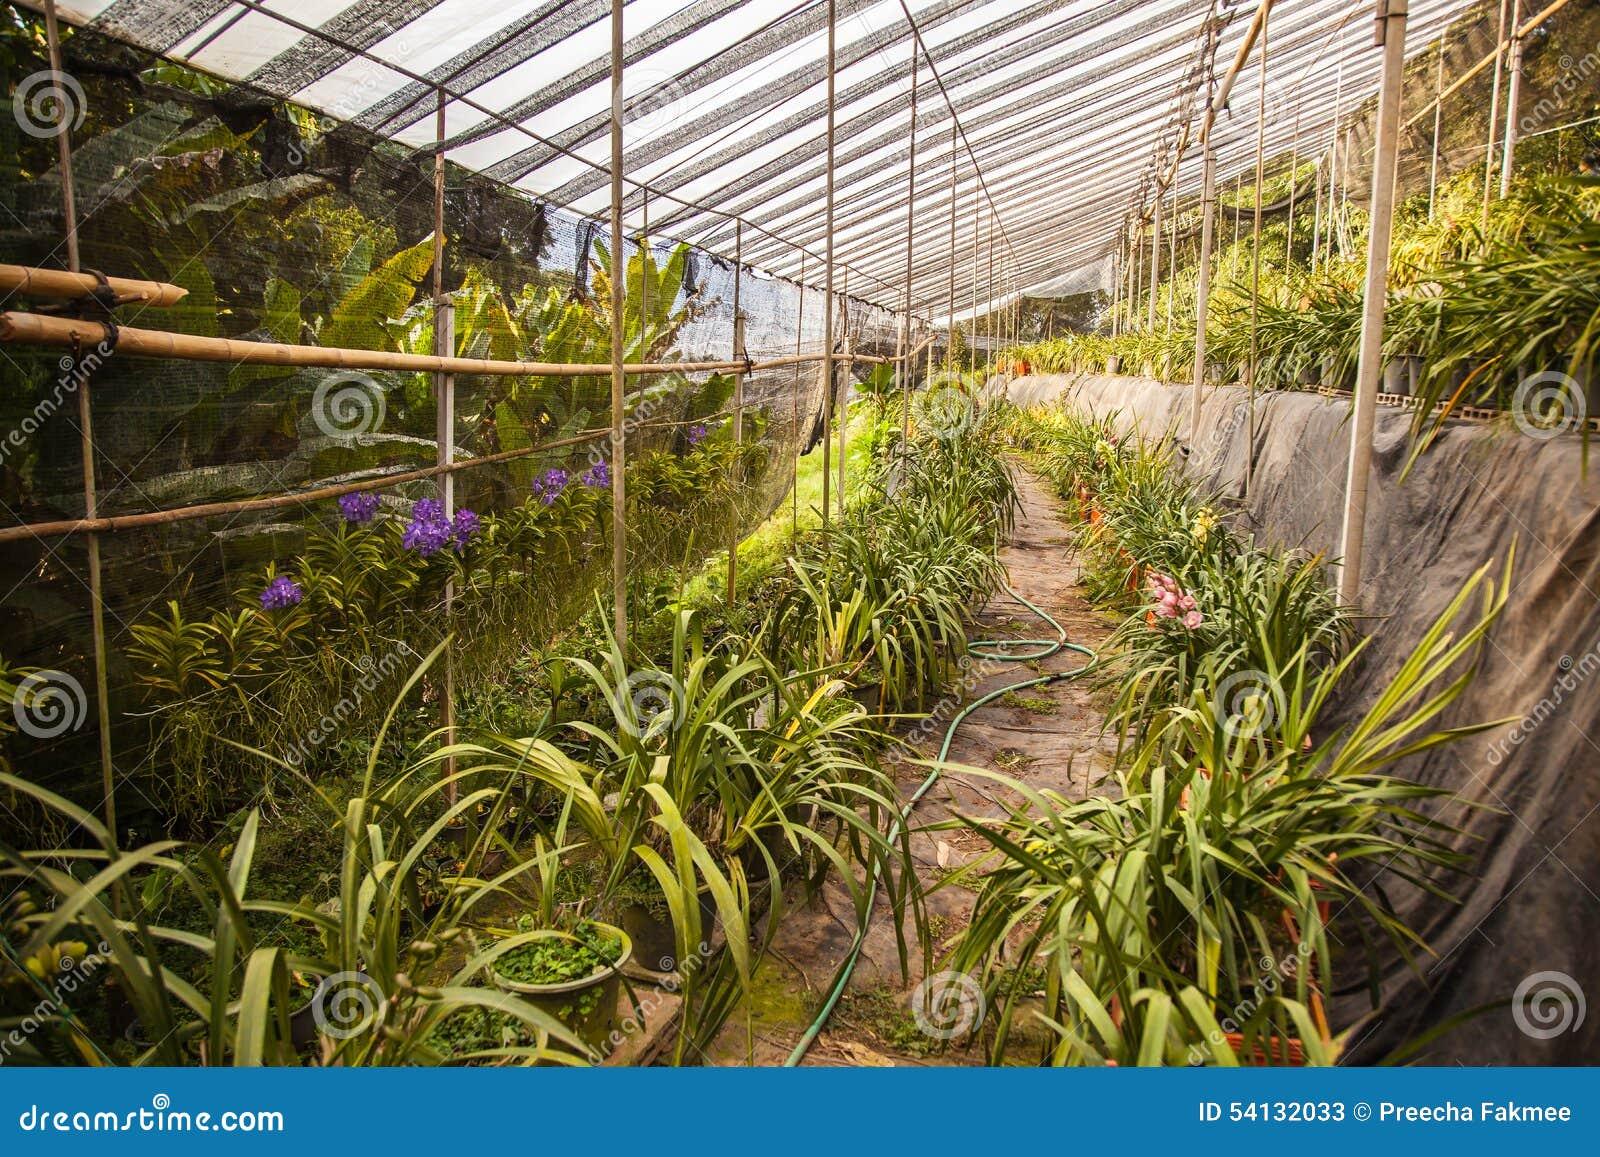 Backyard Flower Farmer : Orchid Flower Farm Stock Photo  Image 54132033